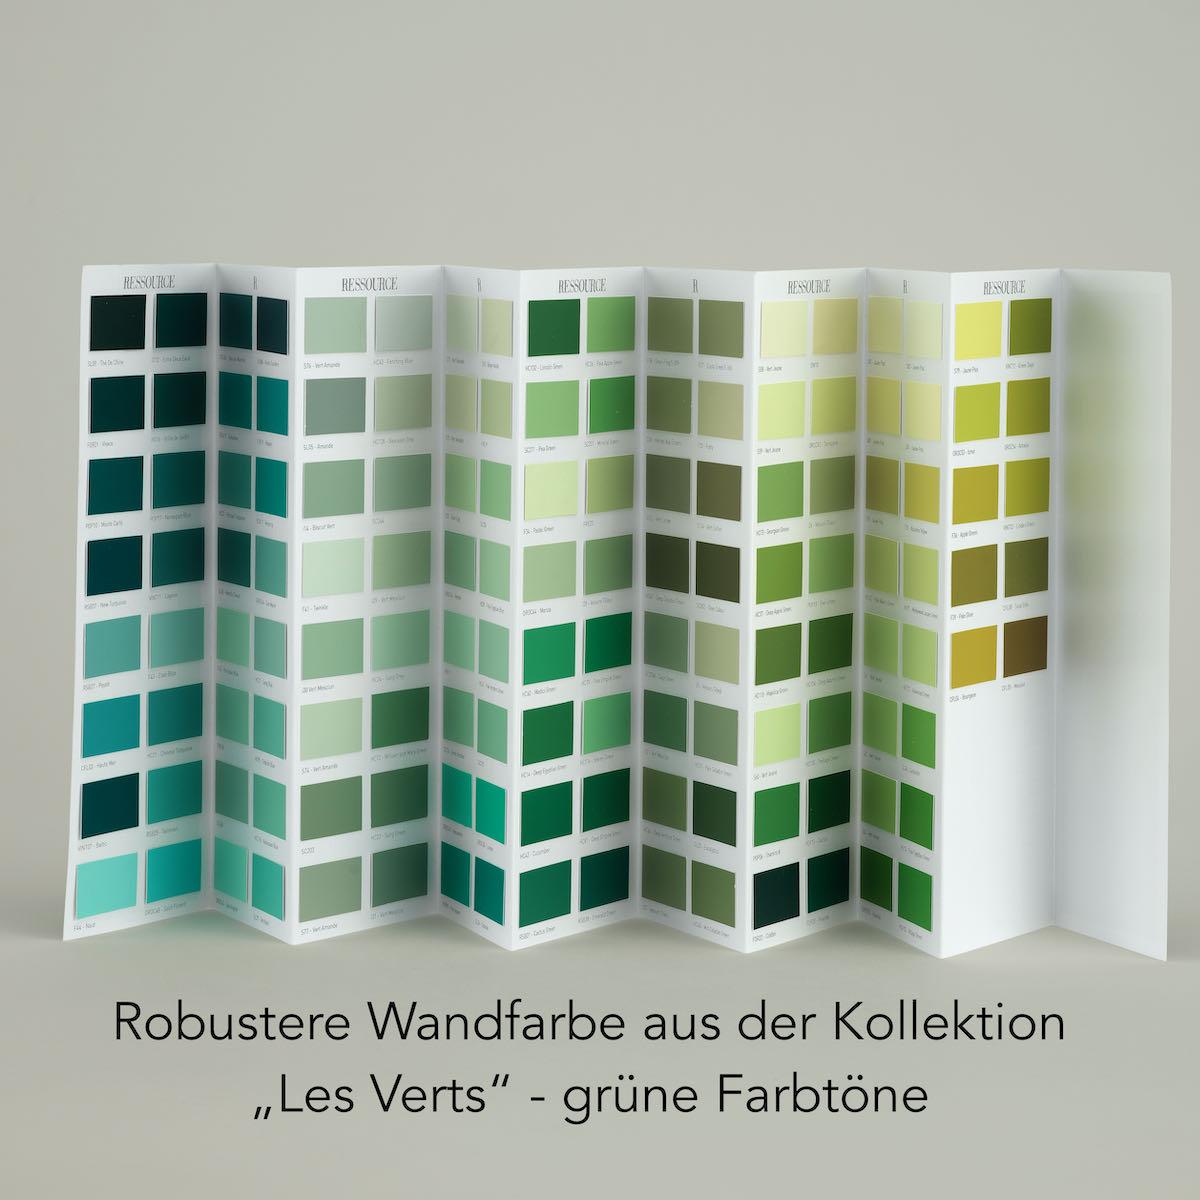 Grüne Farbtöne Ressource